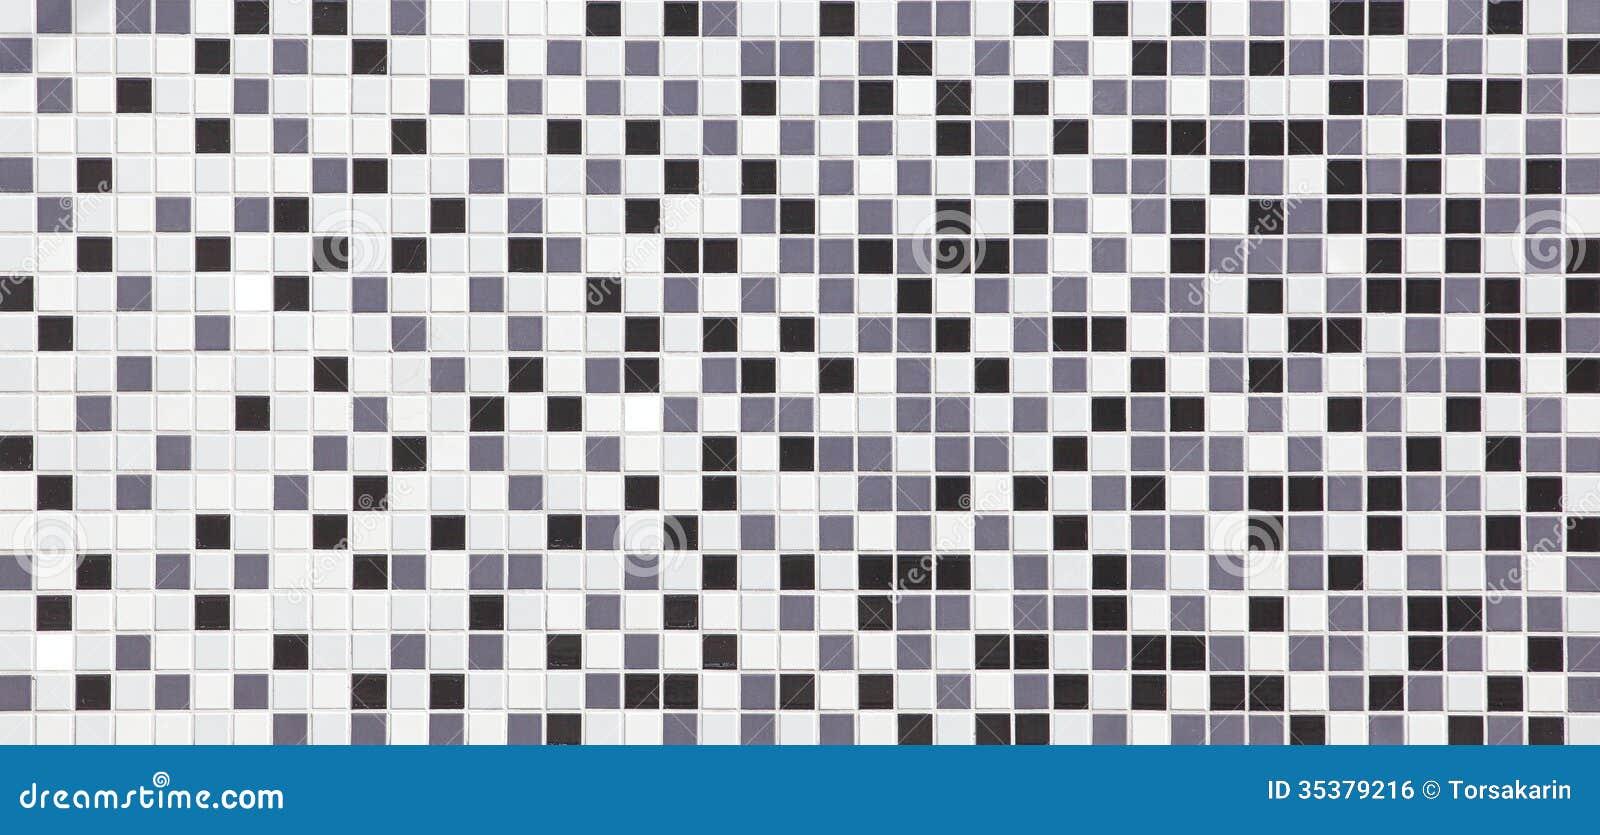 Black And White Tiles Texture Seamless Royalty Free Stock